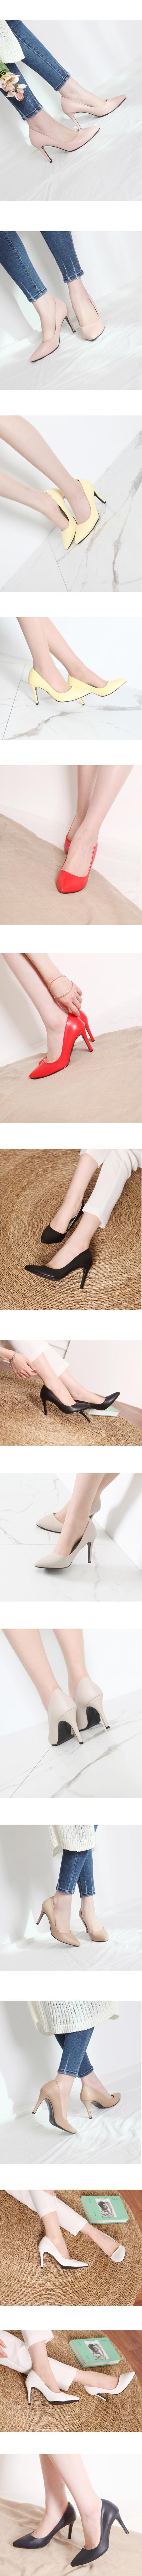 Stiletto High Heel Simple Shoes 9cm Yellow